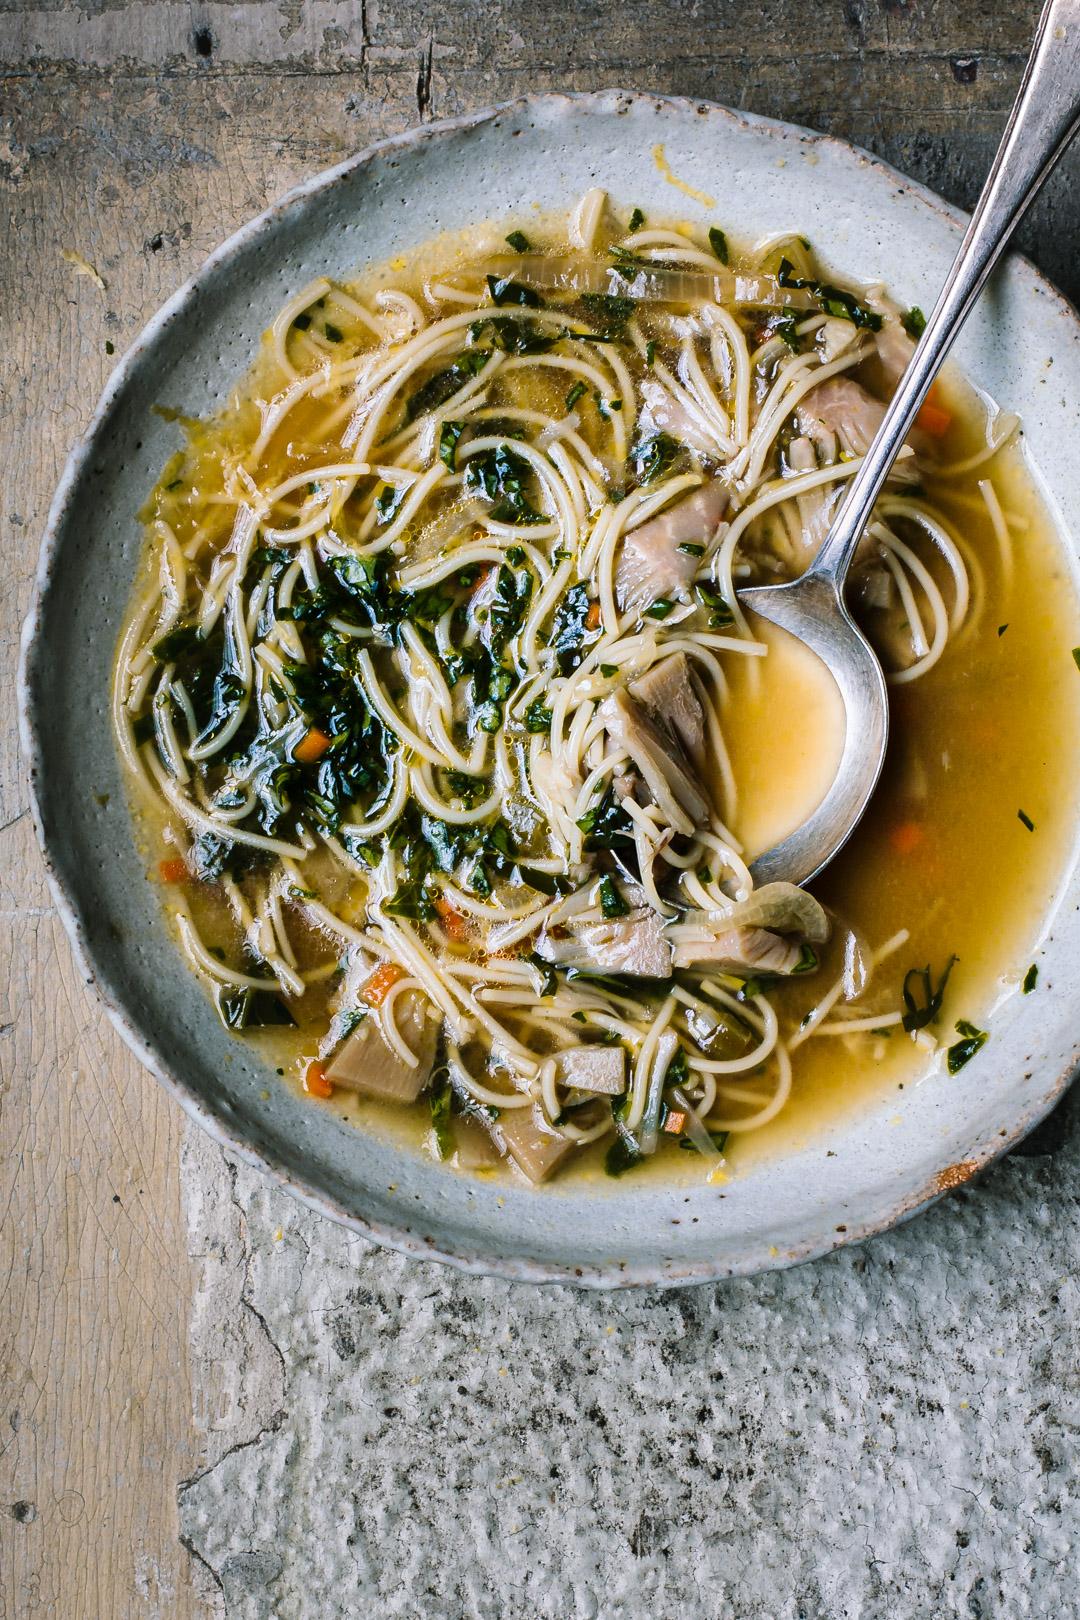 A close up of vegan chicken noodle soup